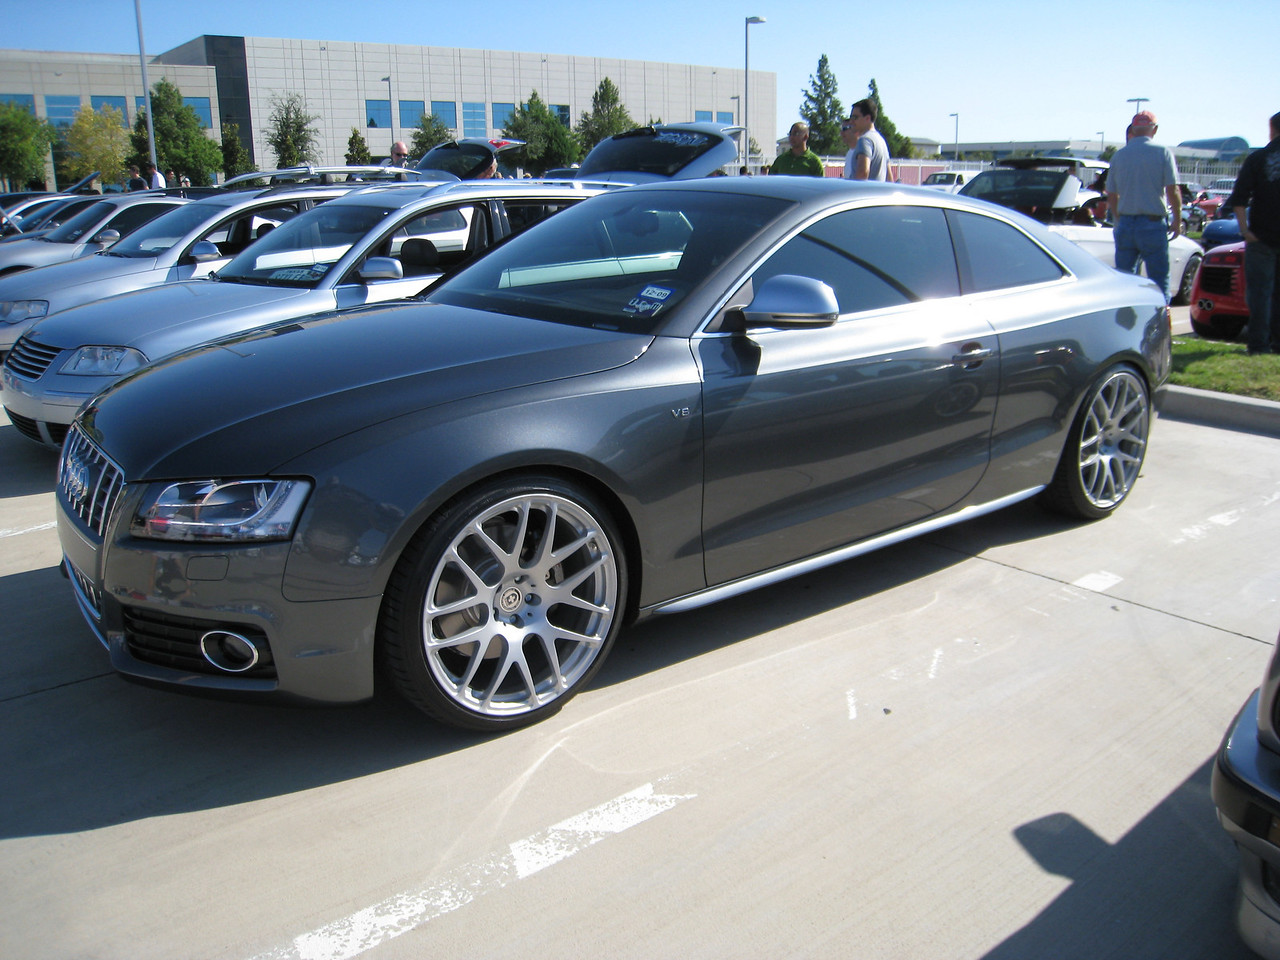 Audi S5 - love those wheels!